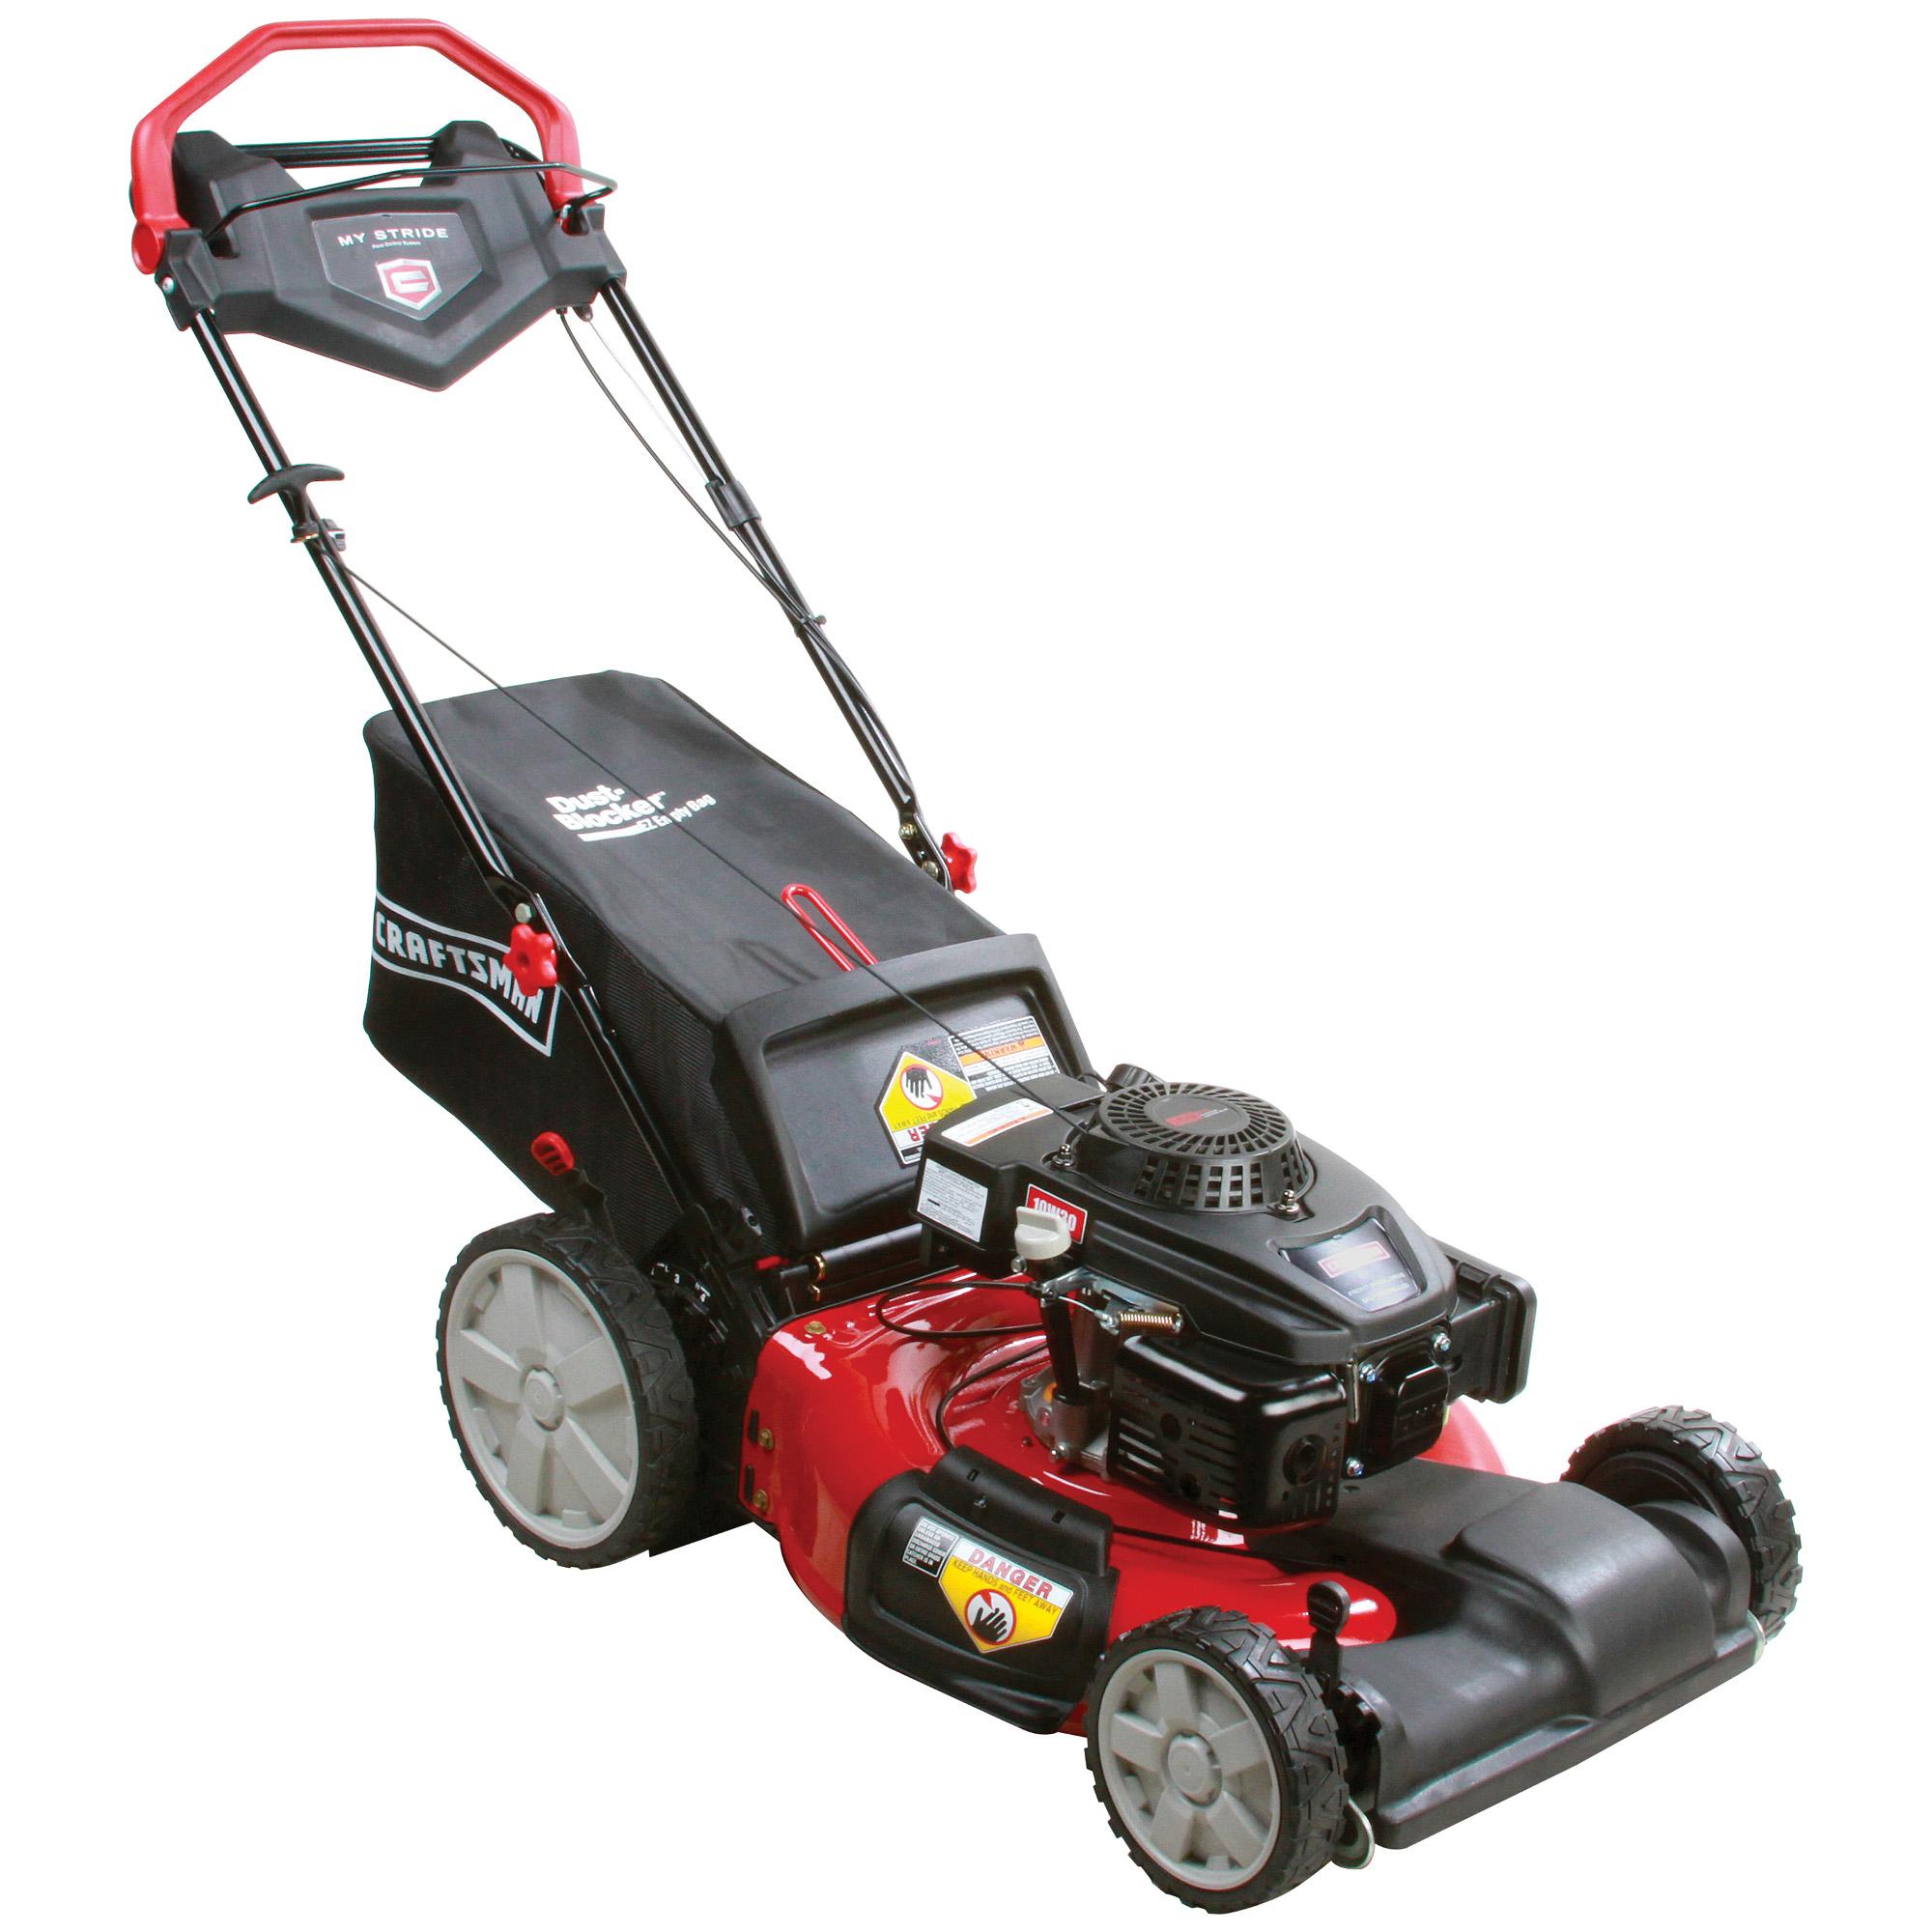 Craftsman Lawn Mower Wheels